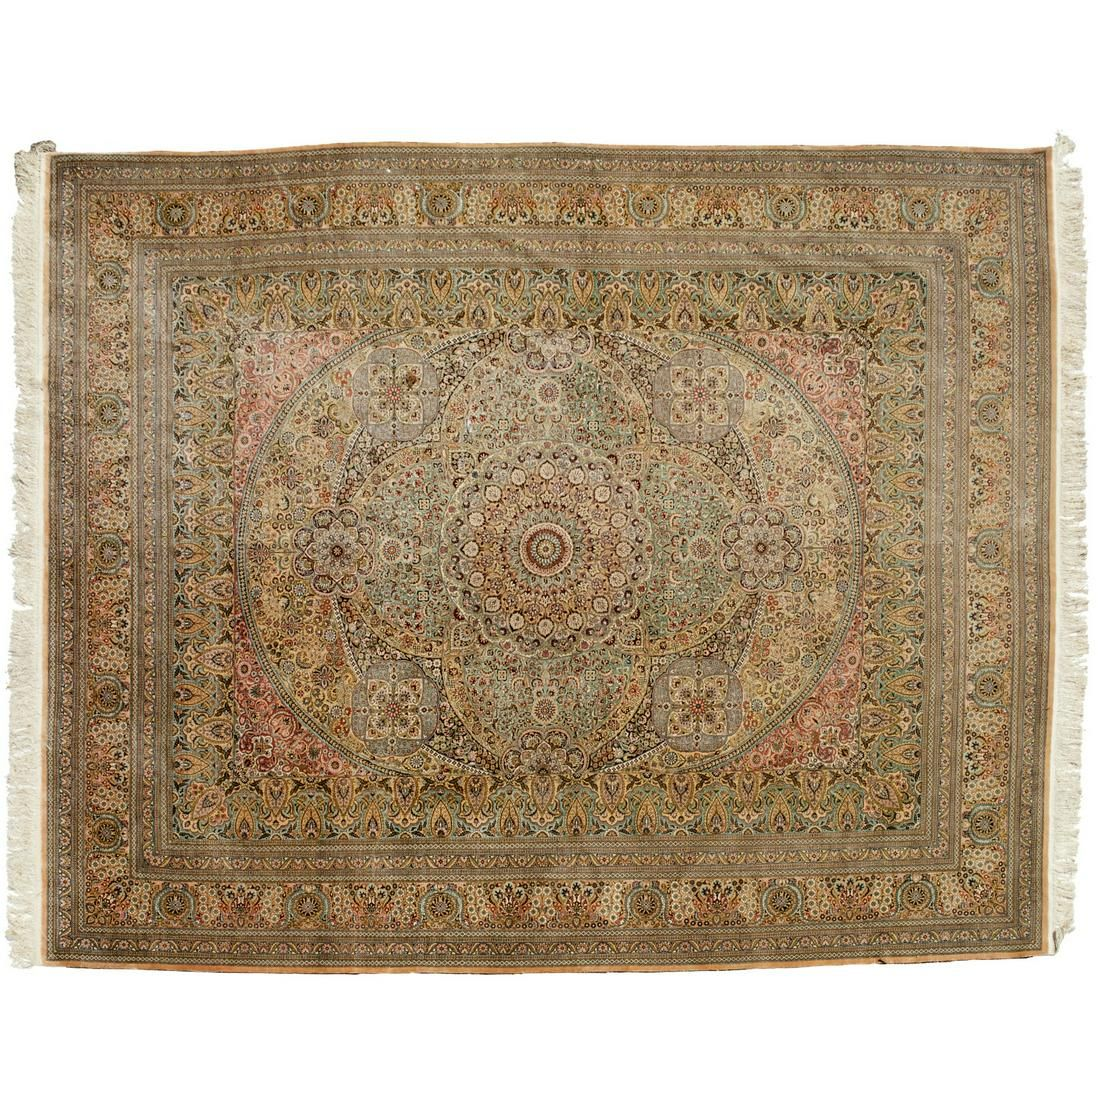 Fine Persian silk carpet